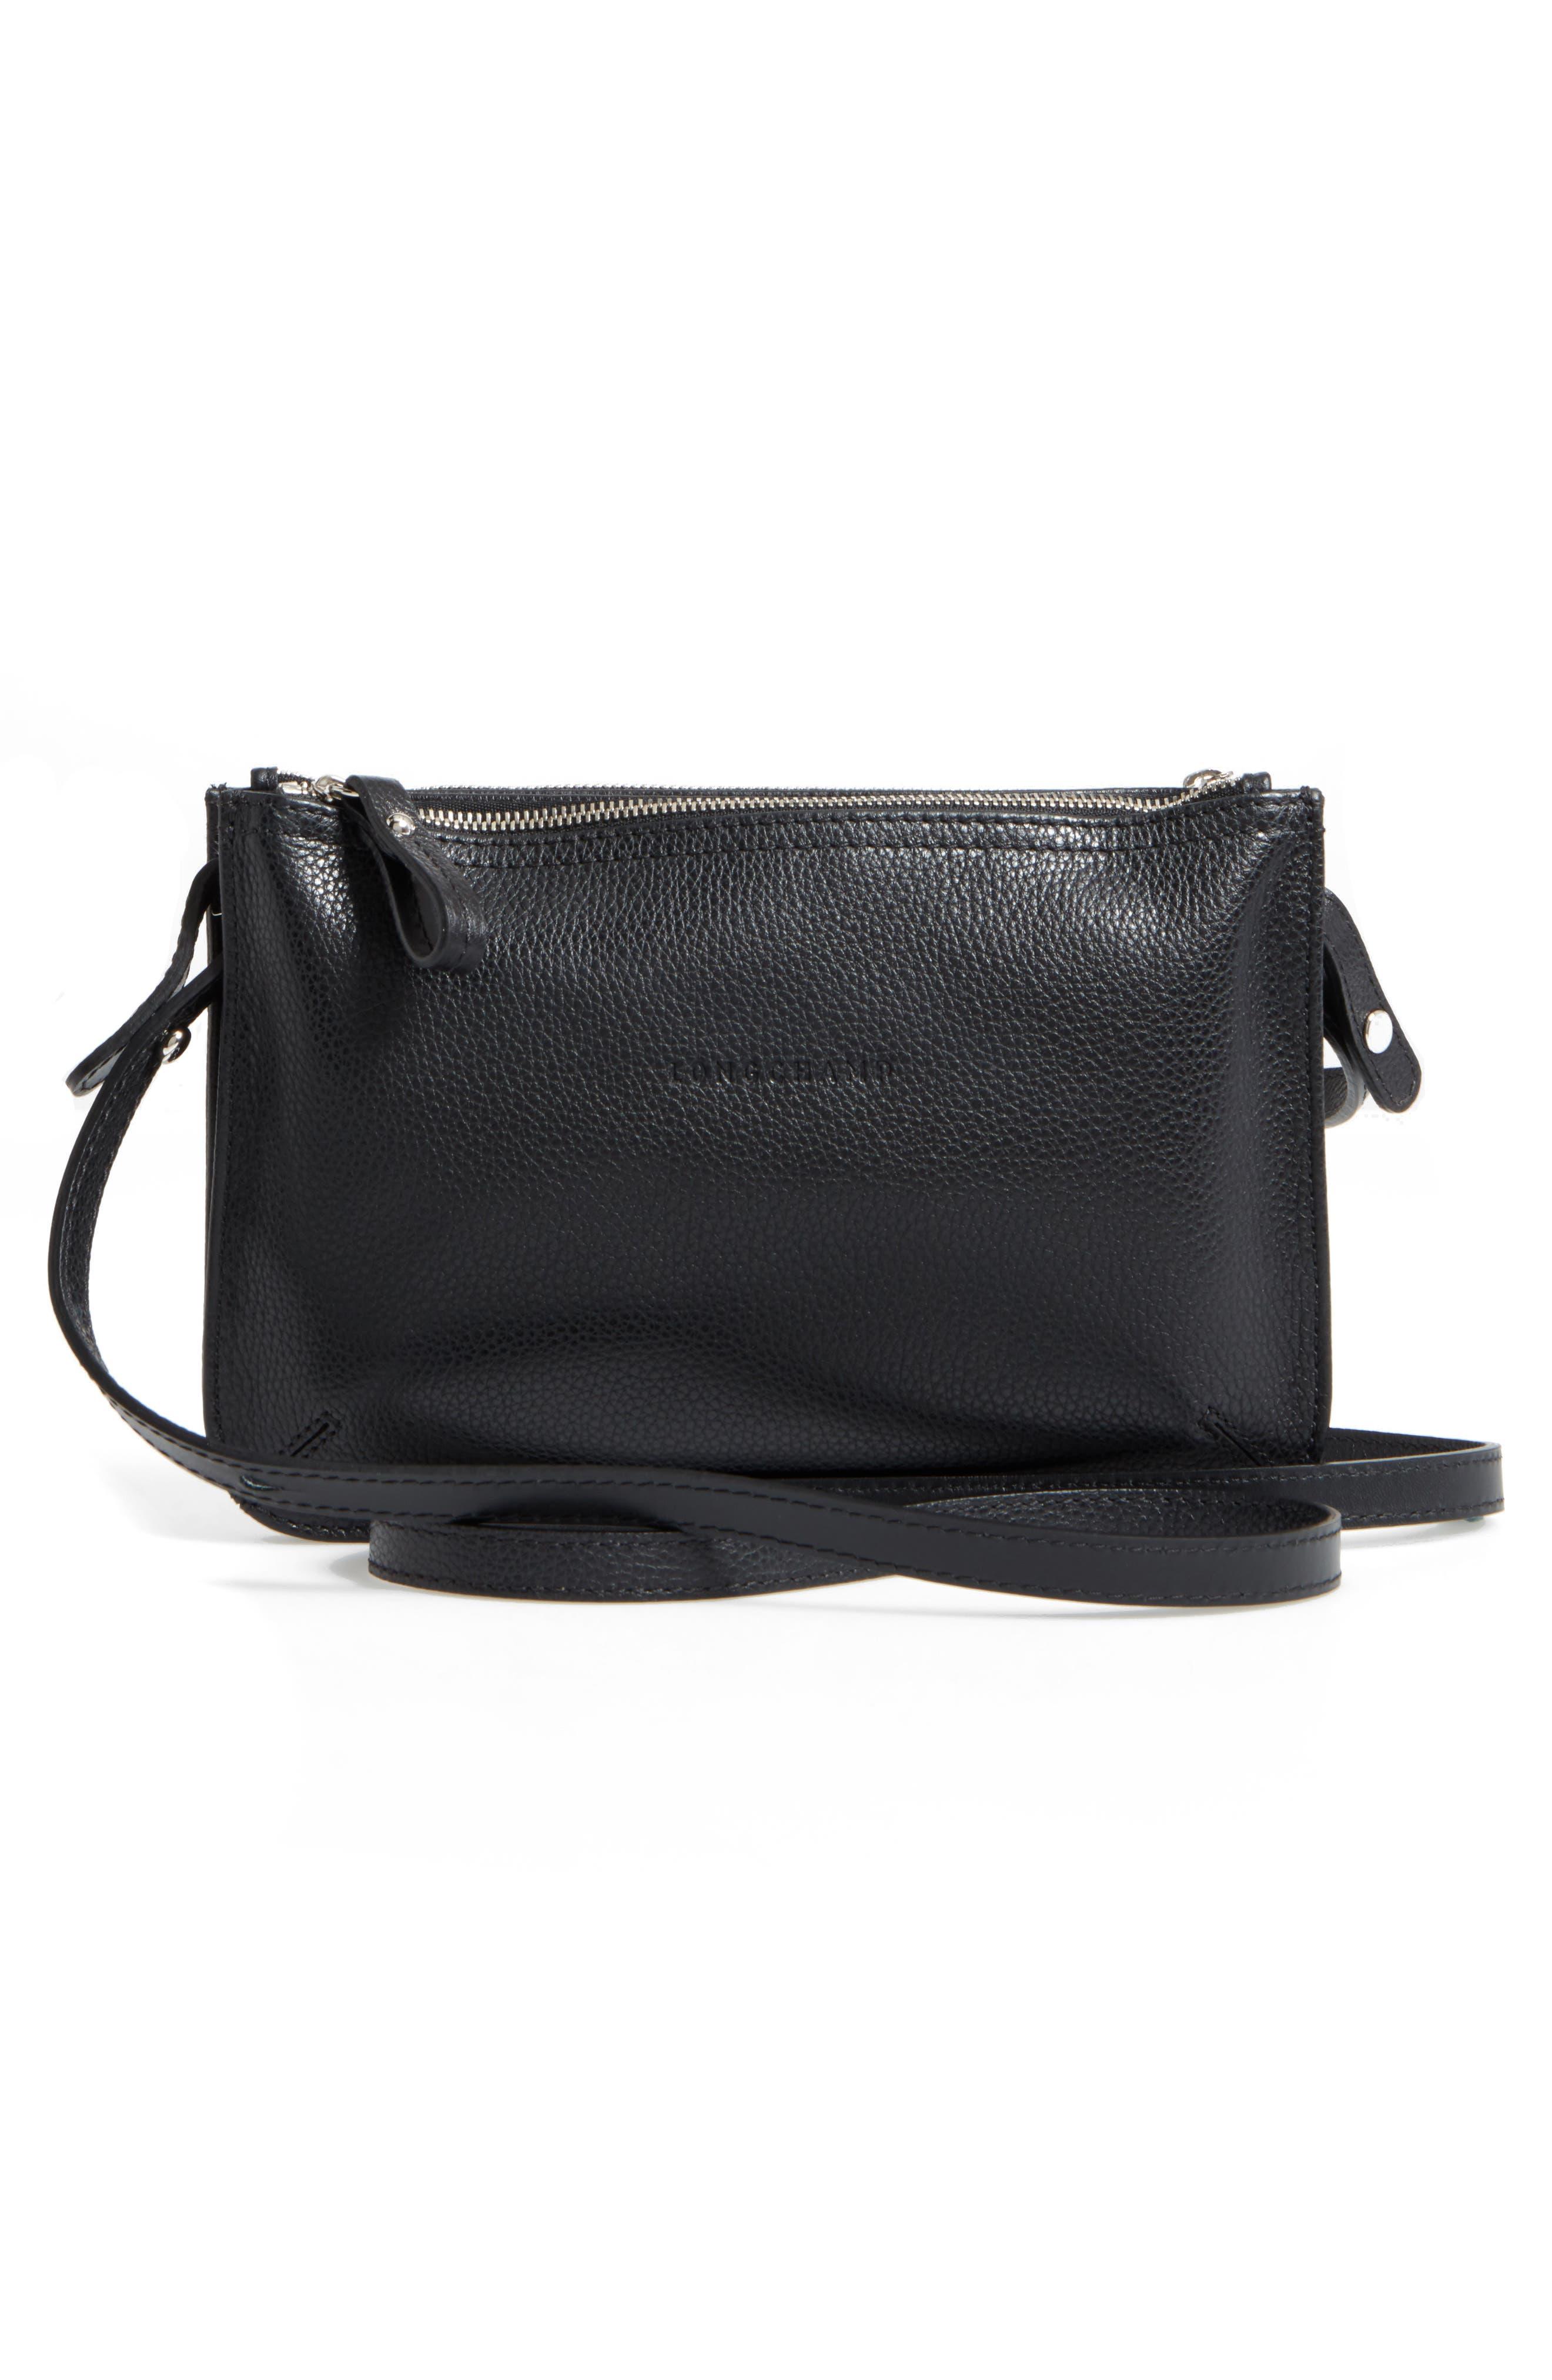 Le Foulonne Leather Crossbody Bag,                             Alternate thumbnail 3, color,                             002